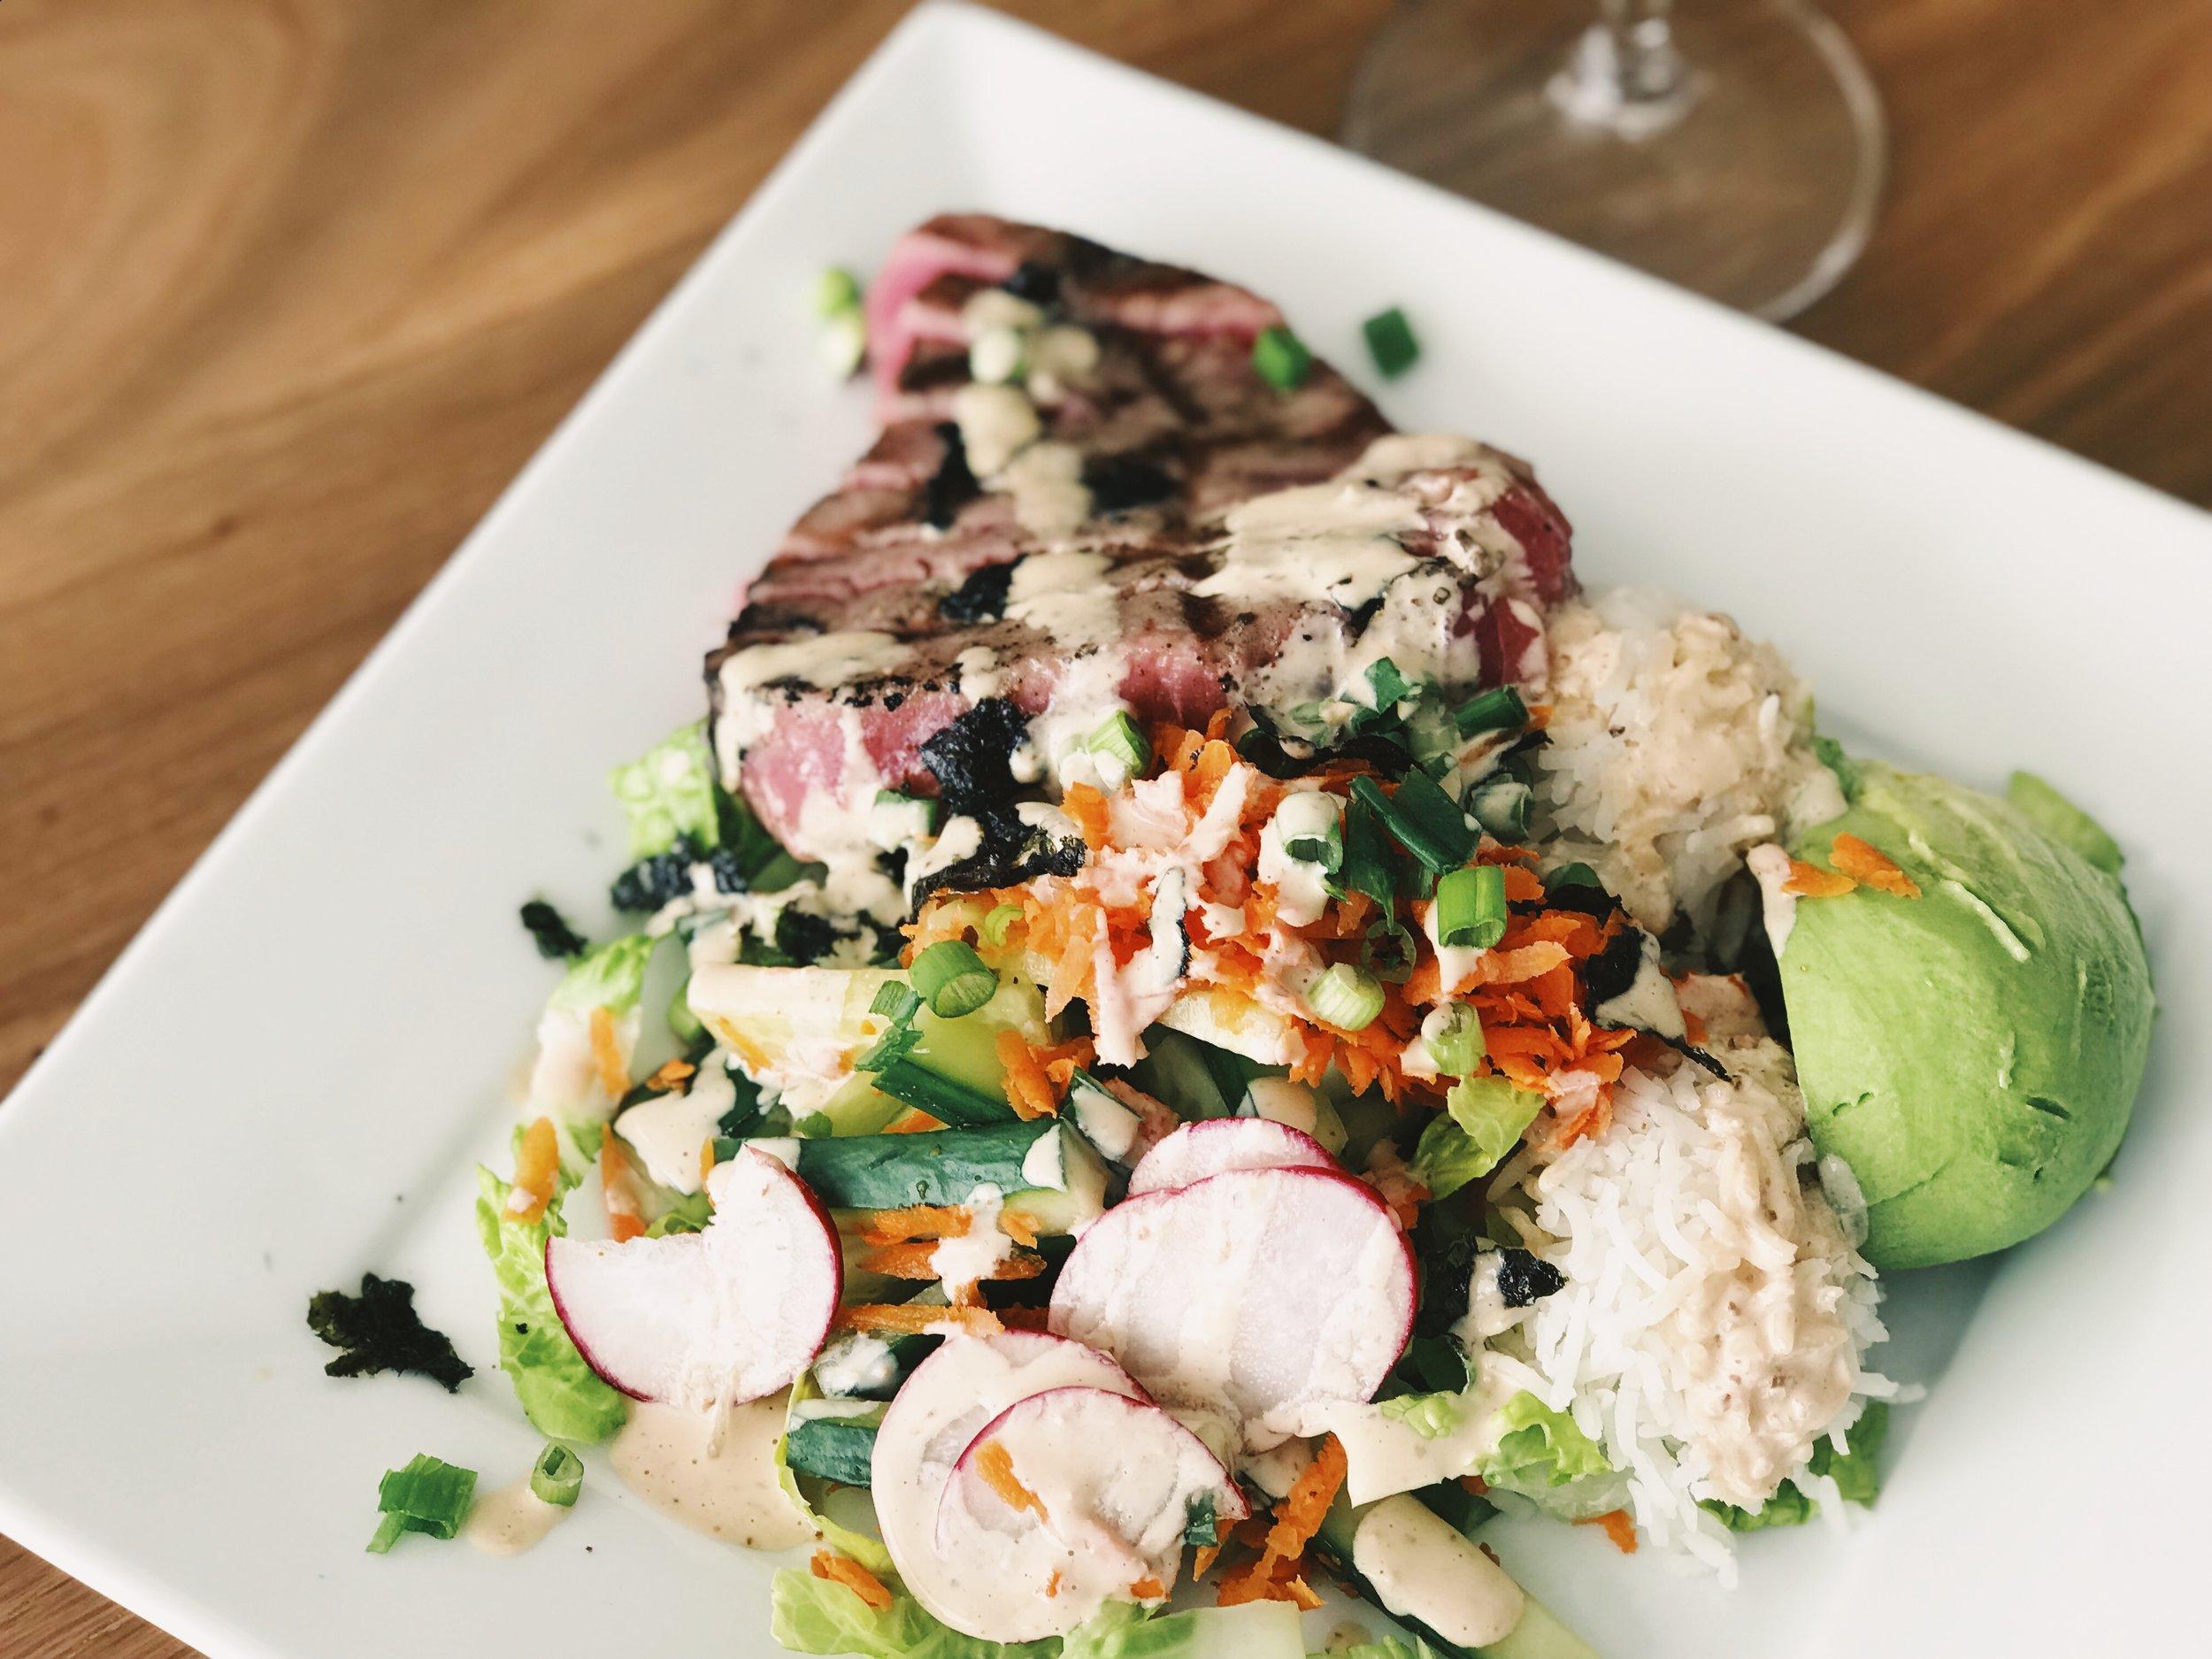 grilled ahi tuna filling salad recipe